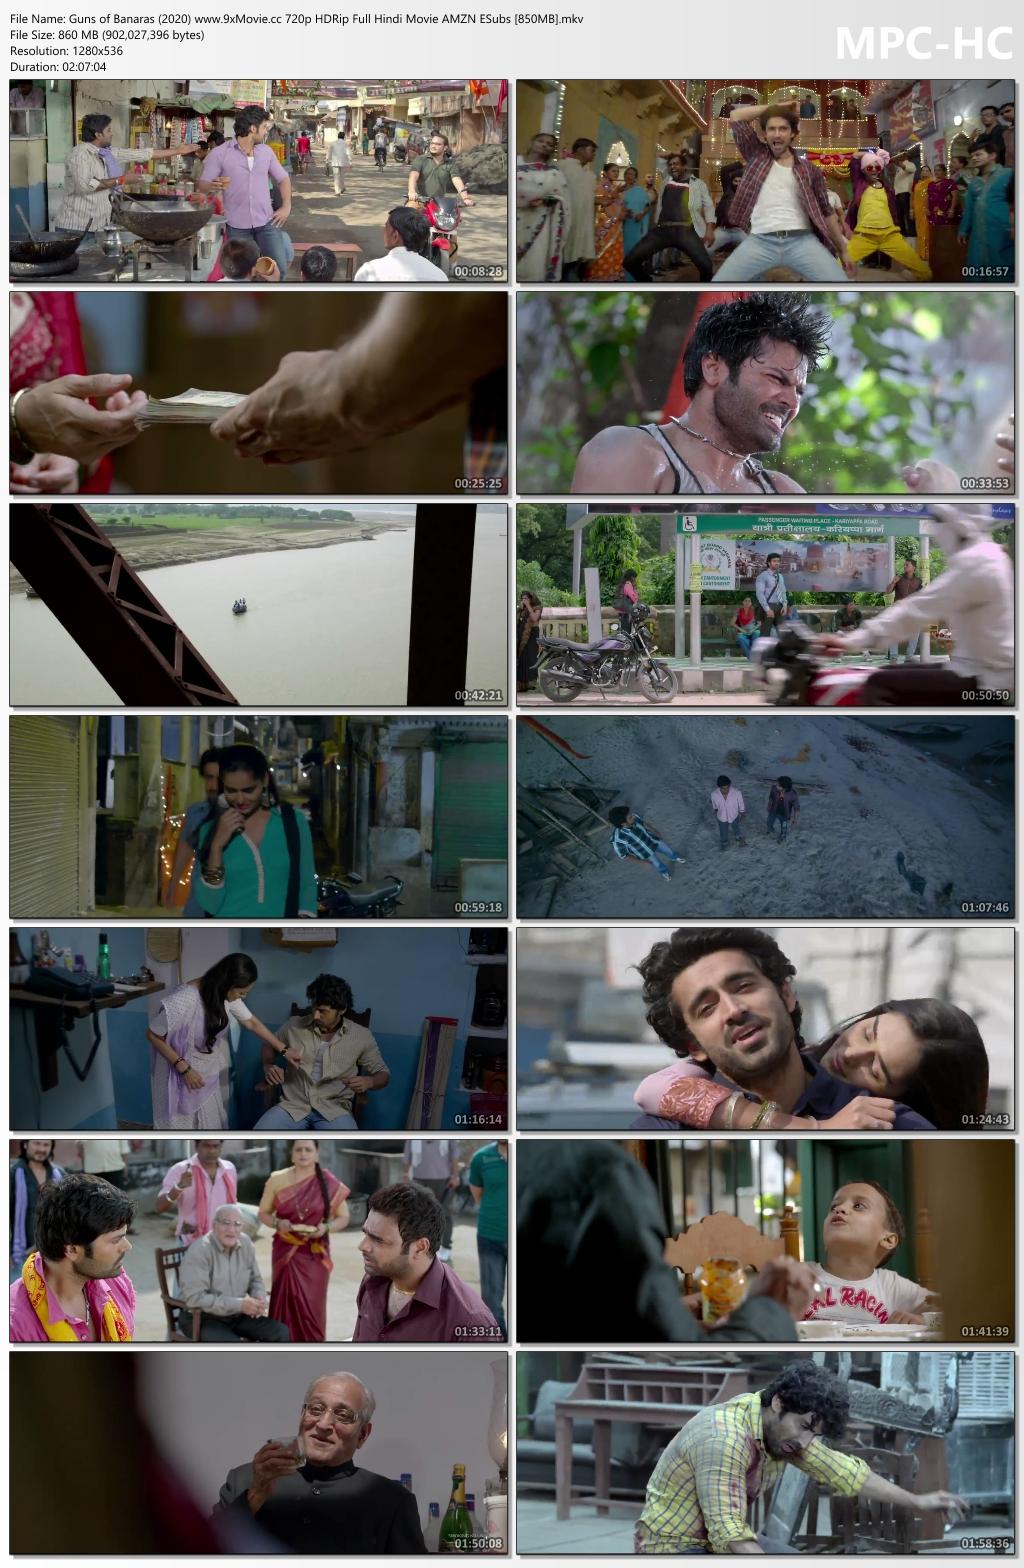 Guns-of-Banaras-2020-www-9x-Movie-cc-720p-HDRip-Full-Hindi-Movie-AMZN-ESubs-850-MB-mkv